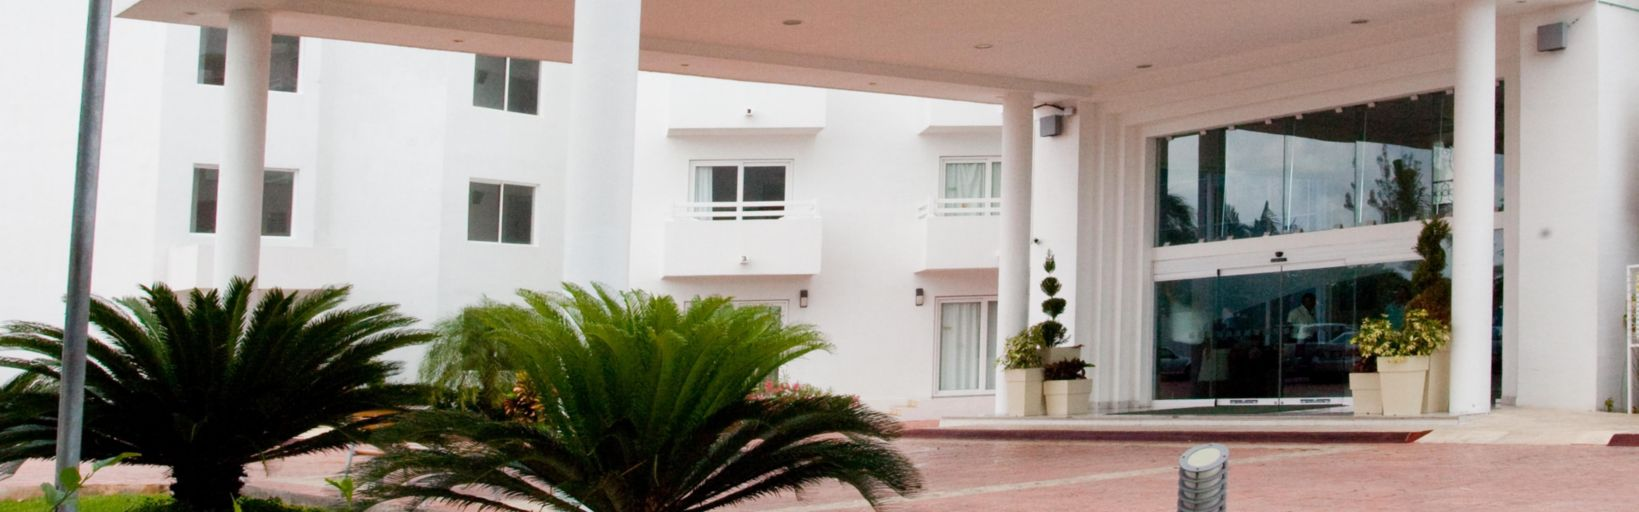 Enbarcadero picture of aquamarina beach hotel cancun tripadvisor - Lobby Front Desk Area Hotel Exterior